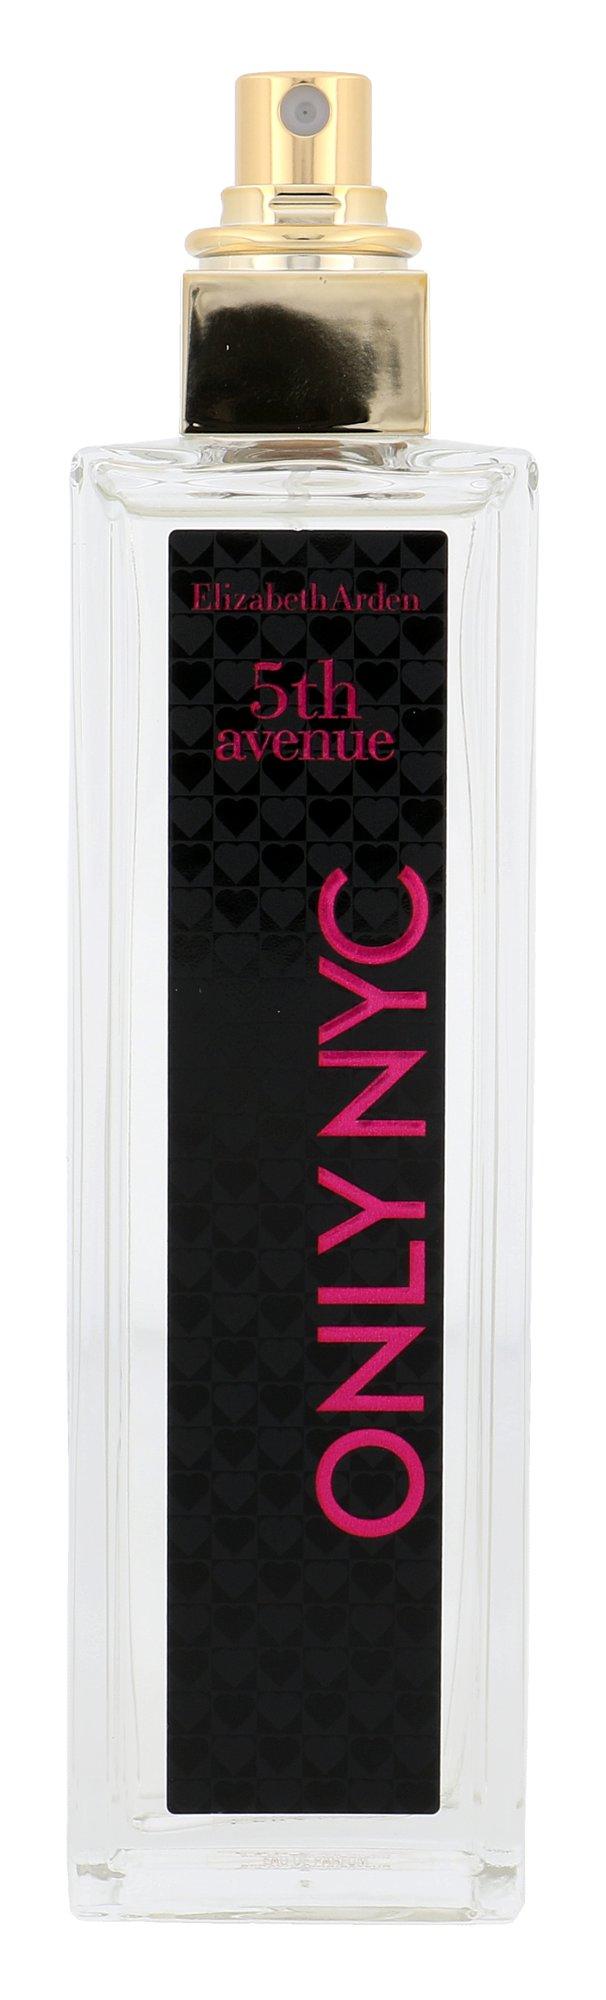 Elizabeth Arden 5th Avenue Only NYC, Parfumovaná voda 75ml, Tester